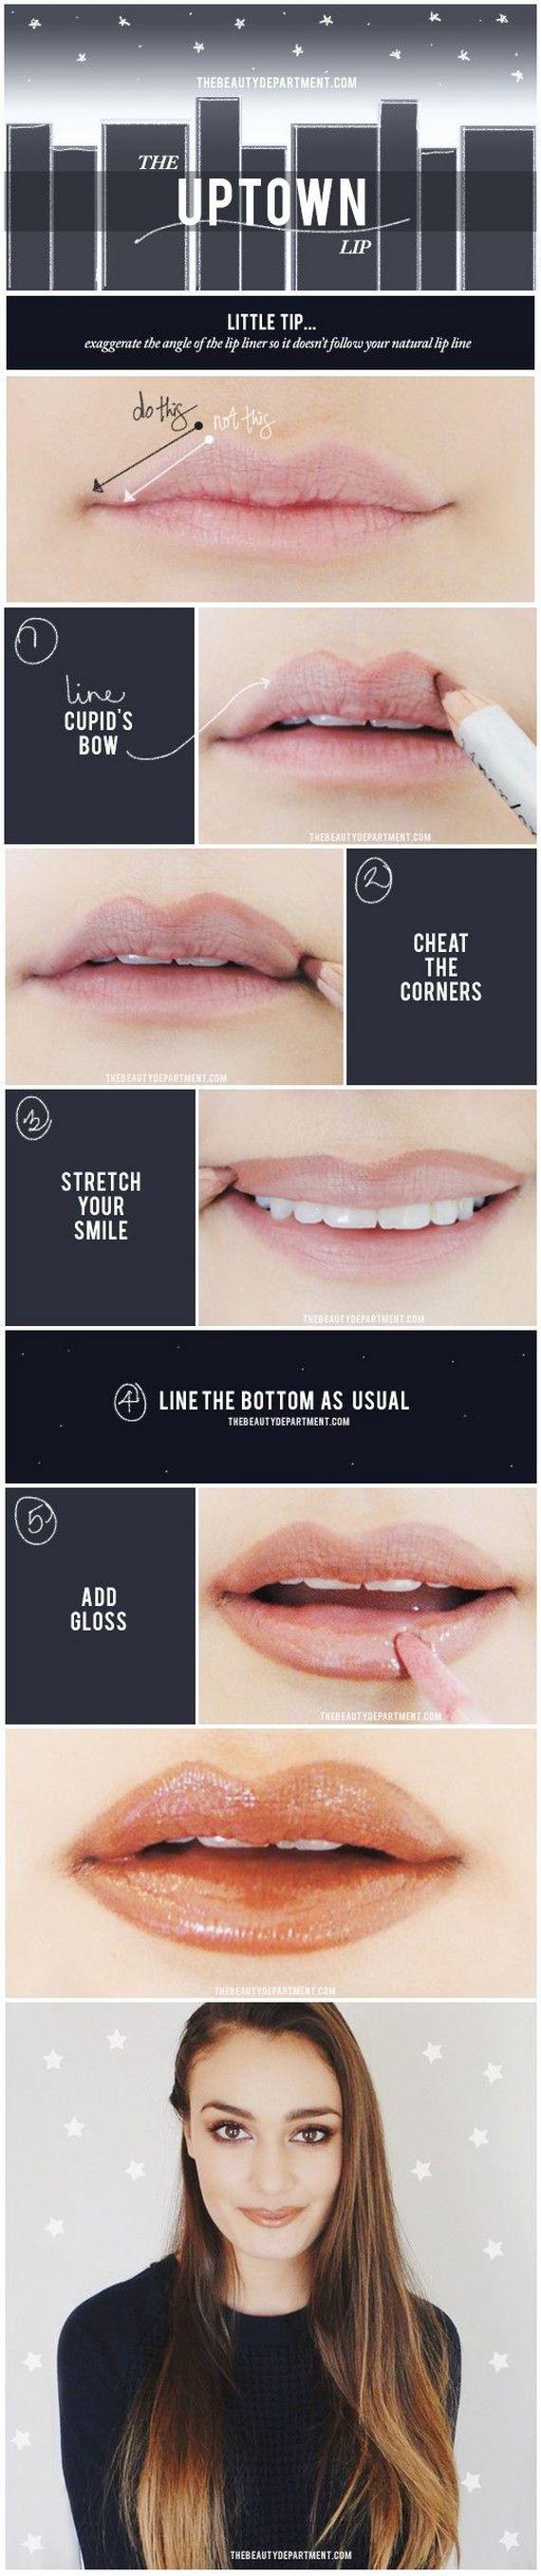 13-Lipstick-Tutorials